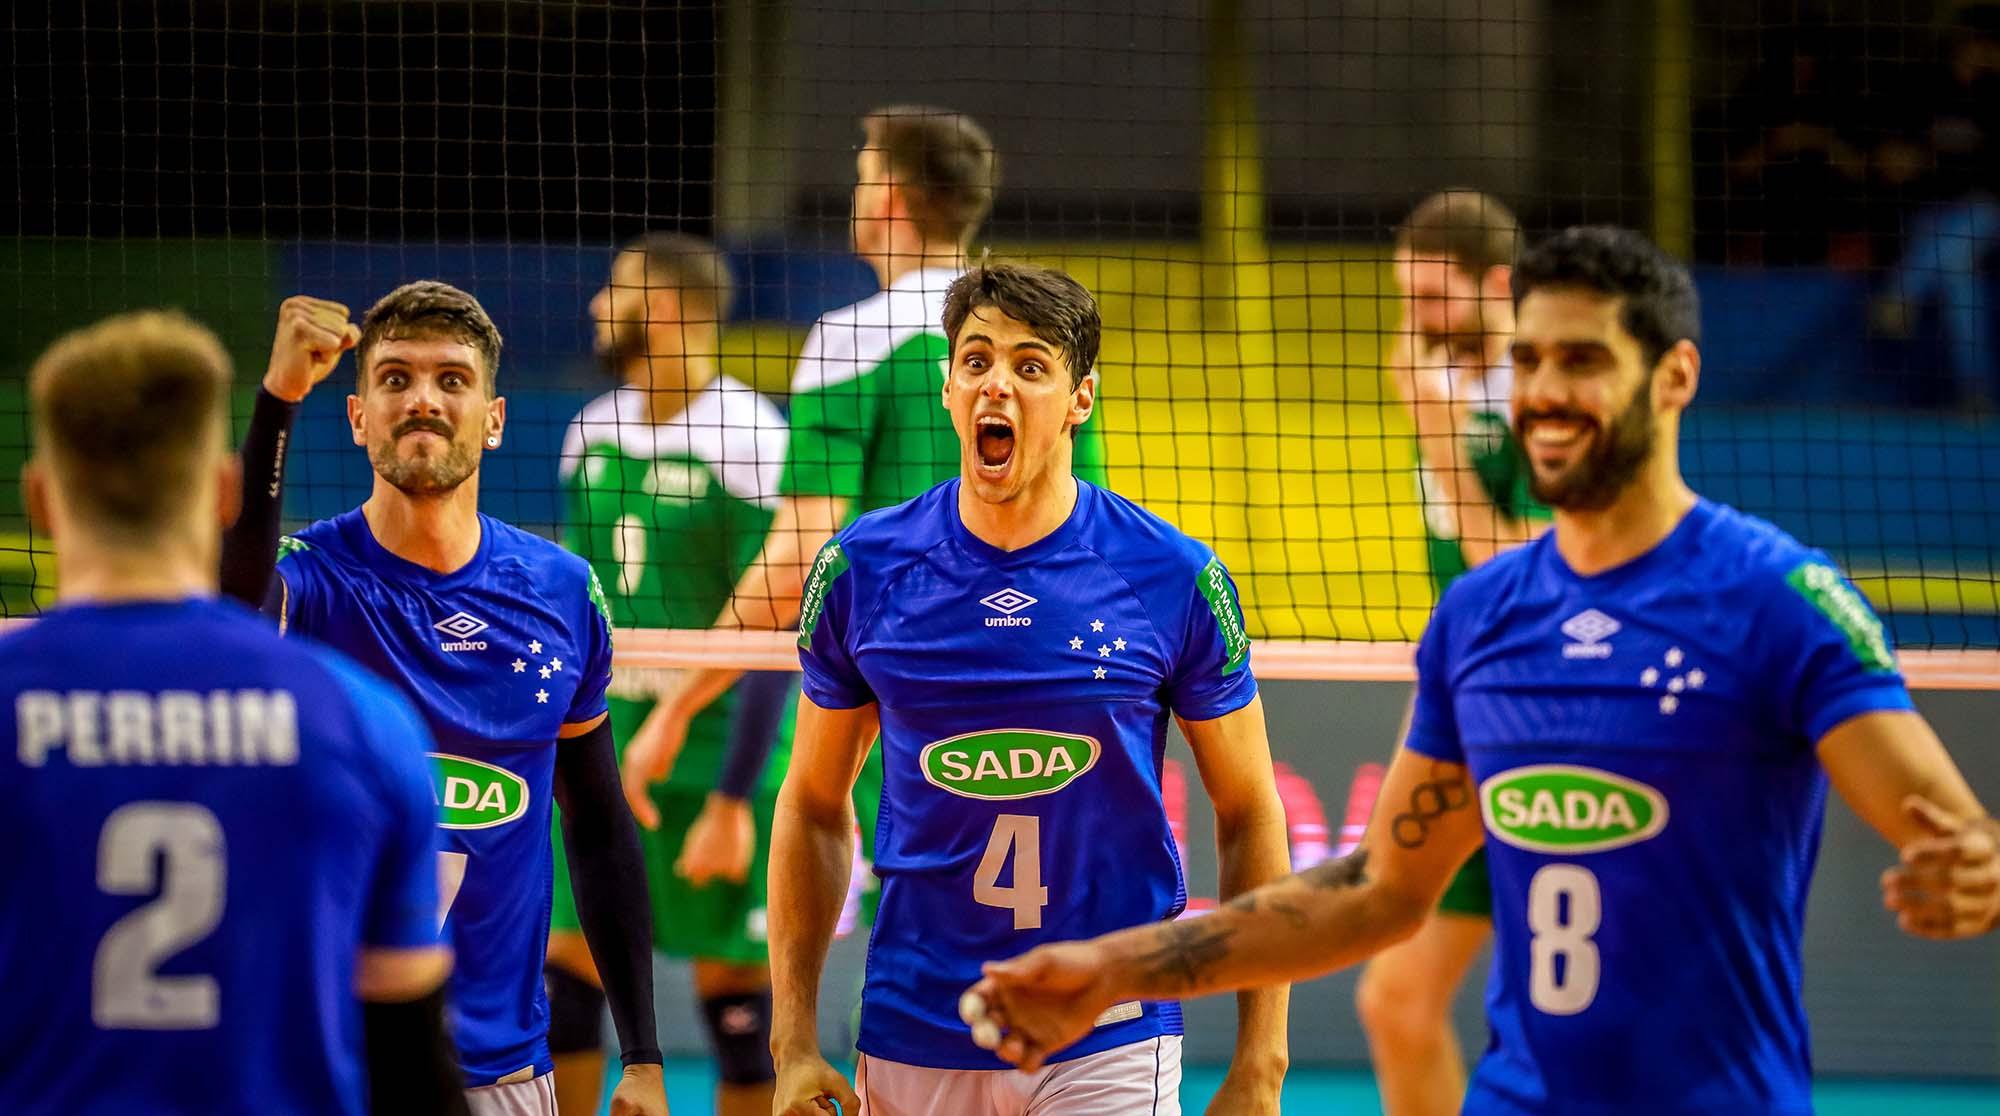 Sada Cruzeiro e Civitanova se enfrentam na grande final?20200528171659